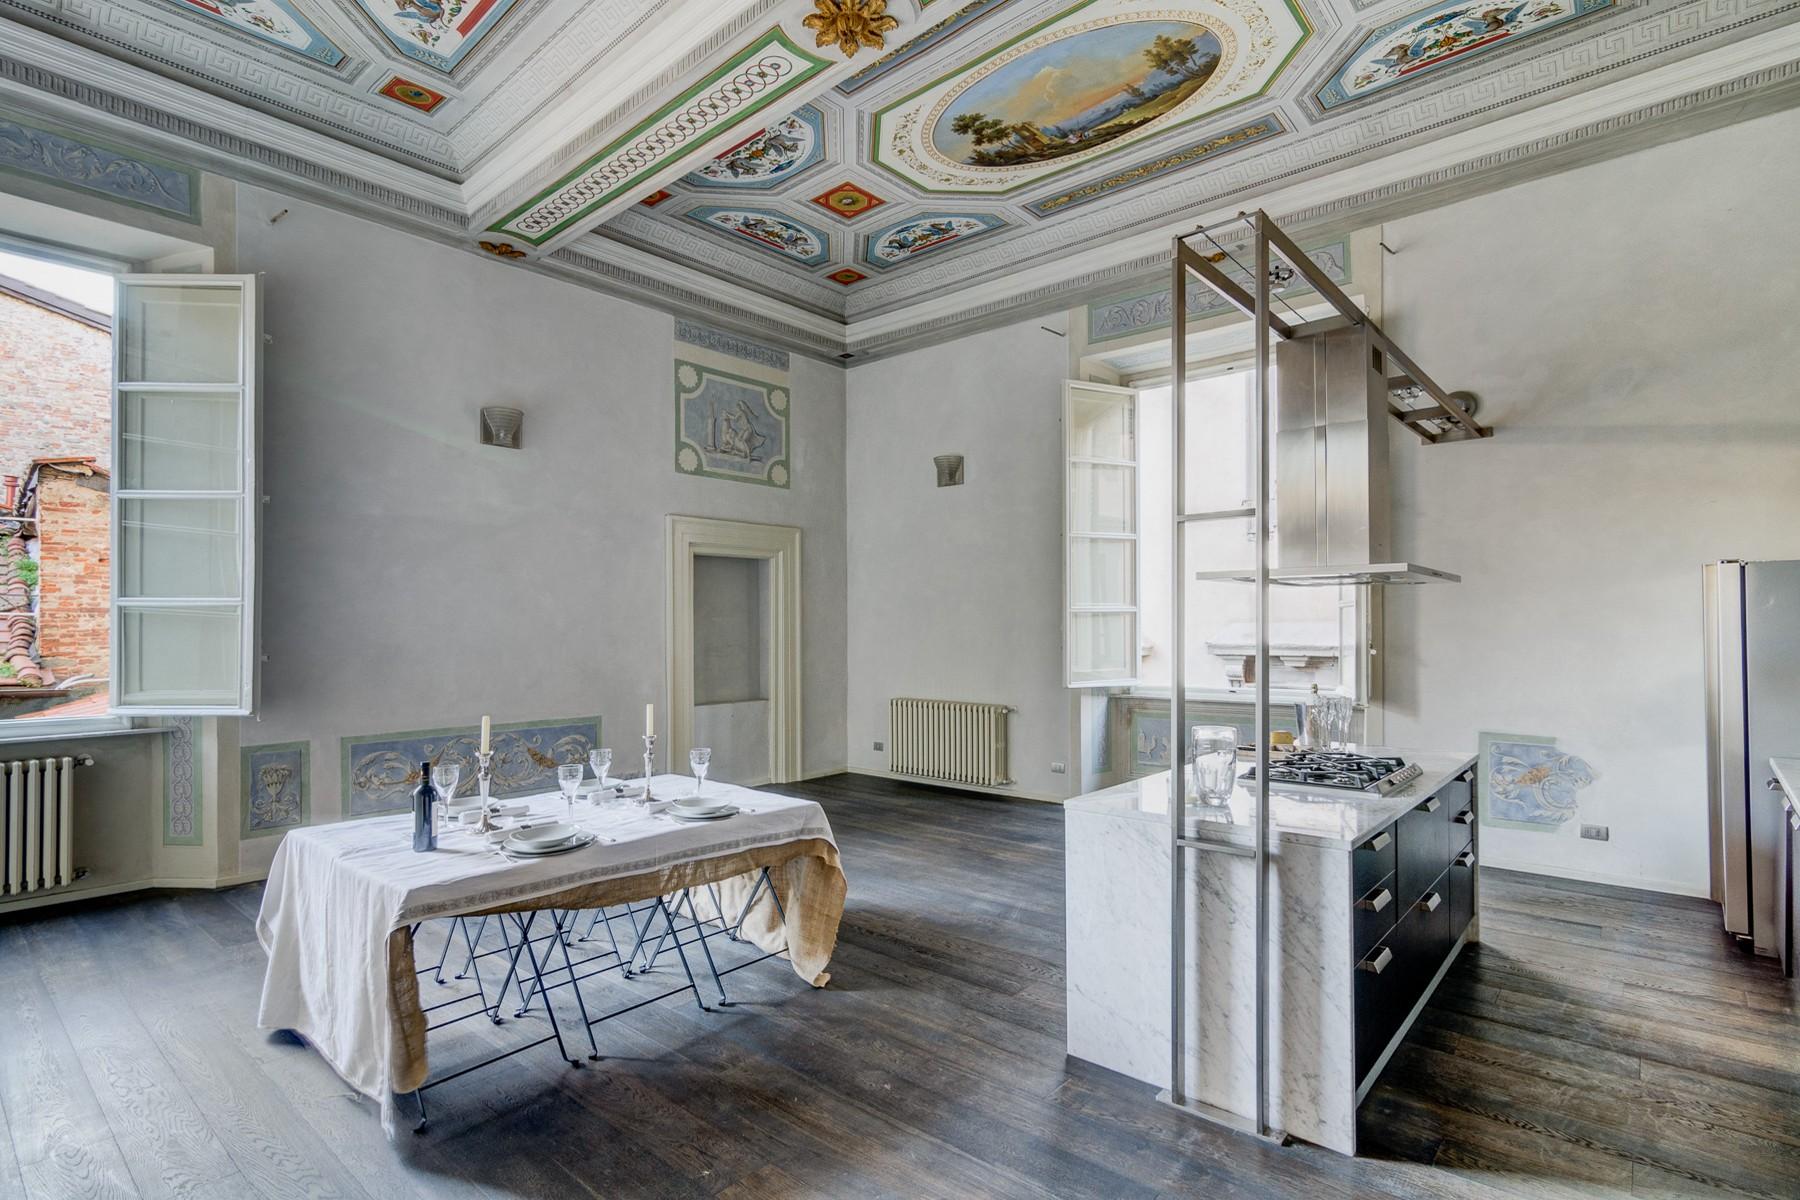 Apartamento por un Venta en Exclusive and elegant apartment Via San Giorgio Lucca, Lucca 55100 Italia